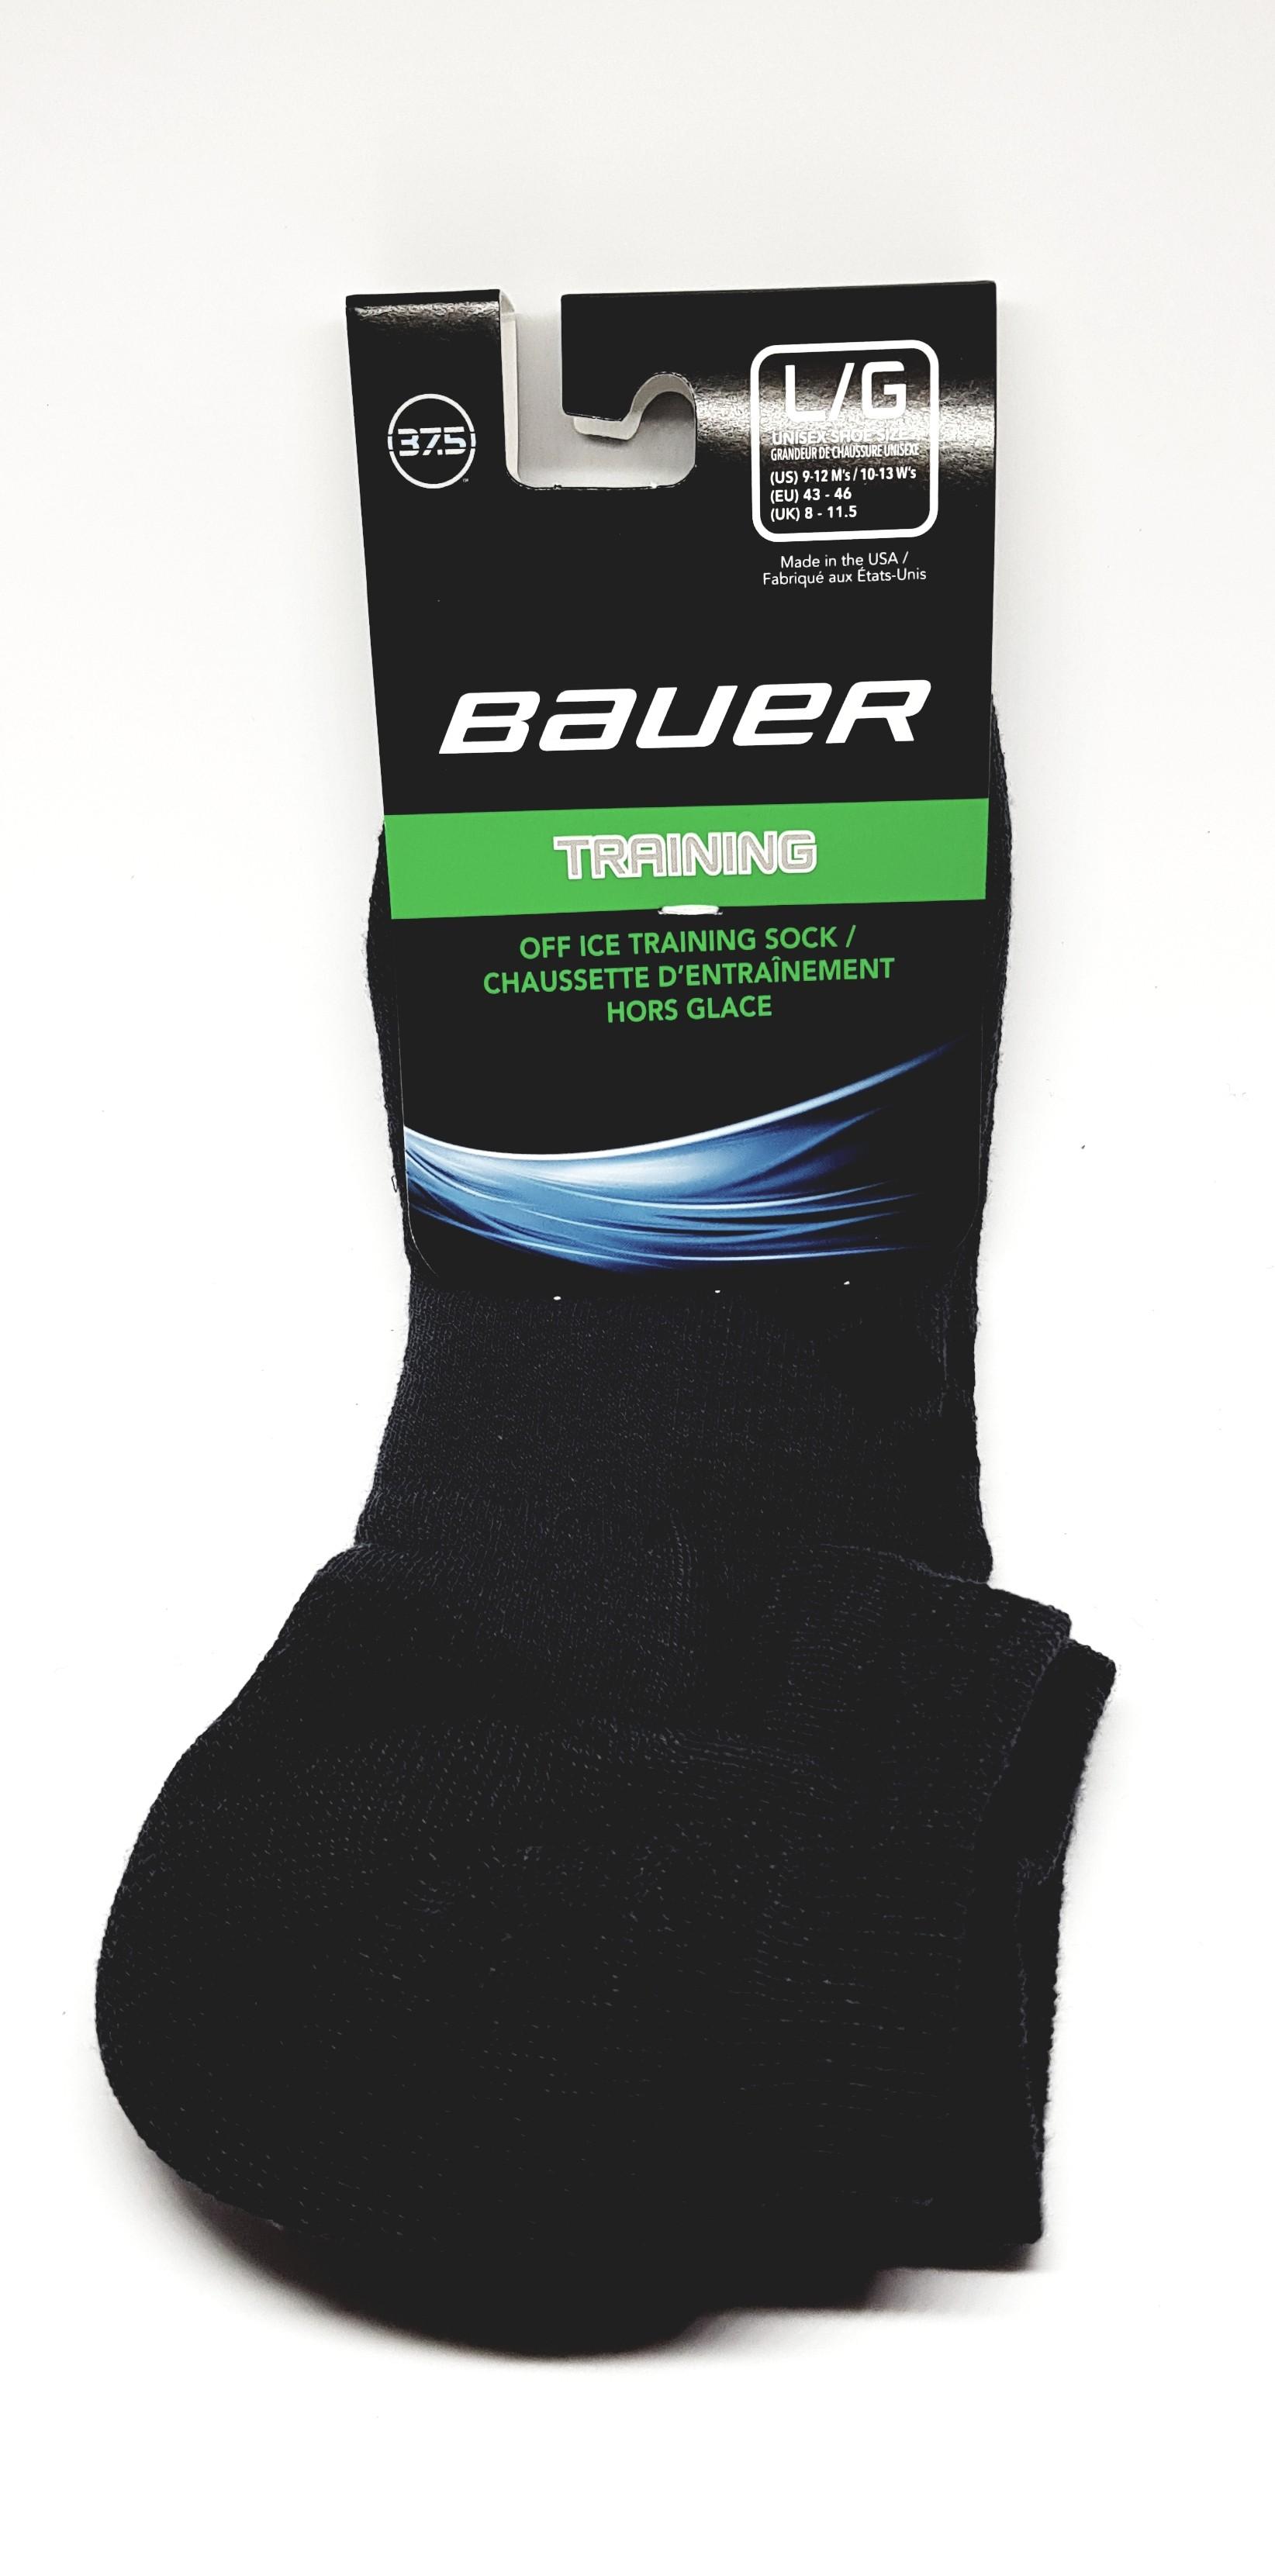 Bauer Training Low Cut Socks